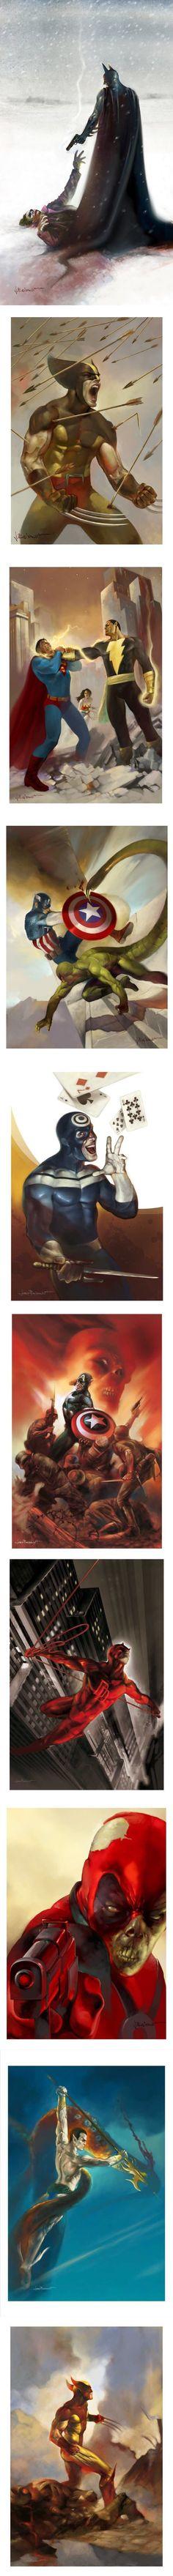 Spectacular Comic Book Illustrations